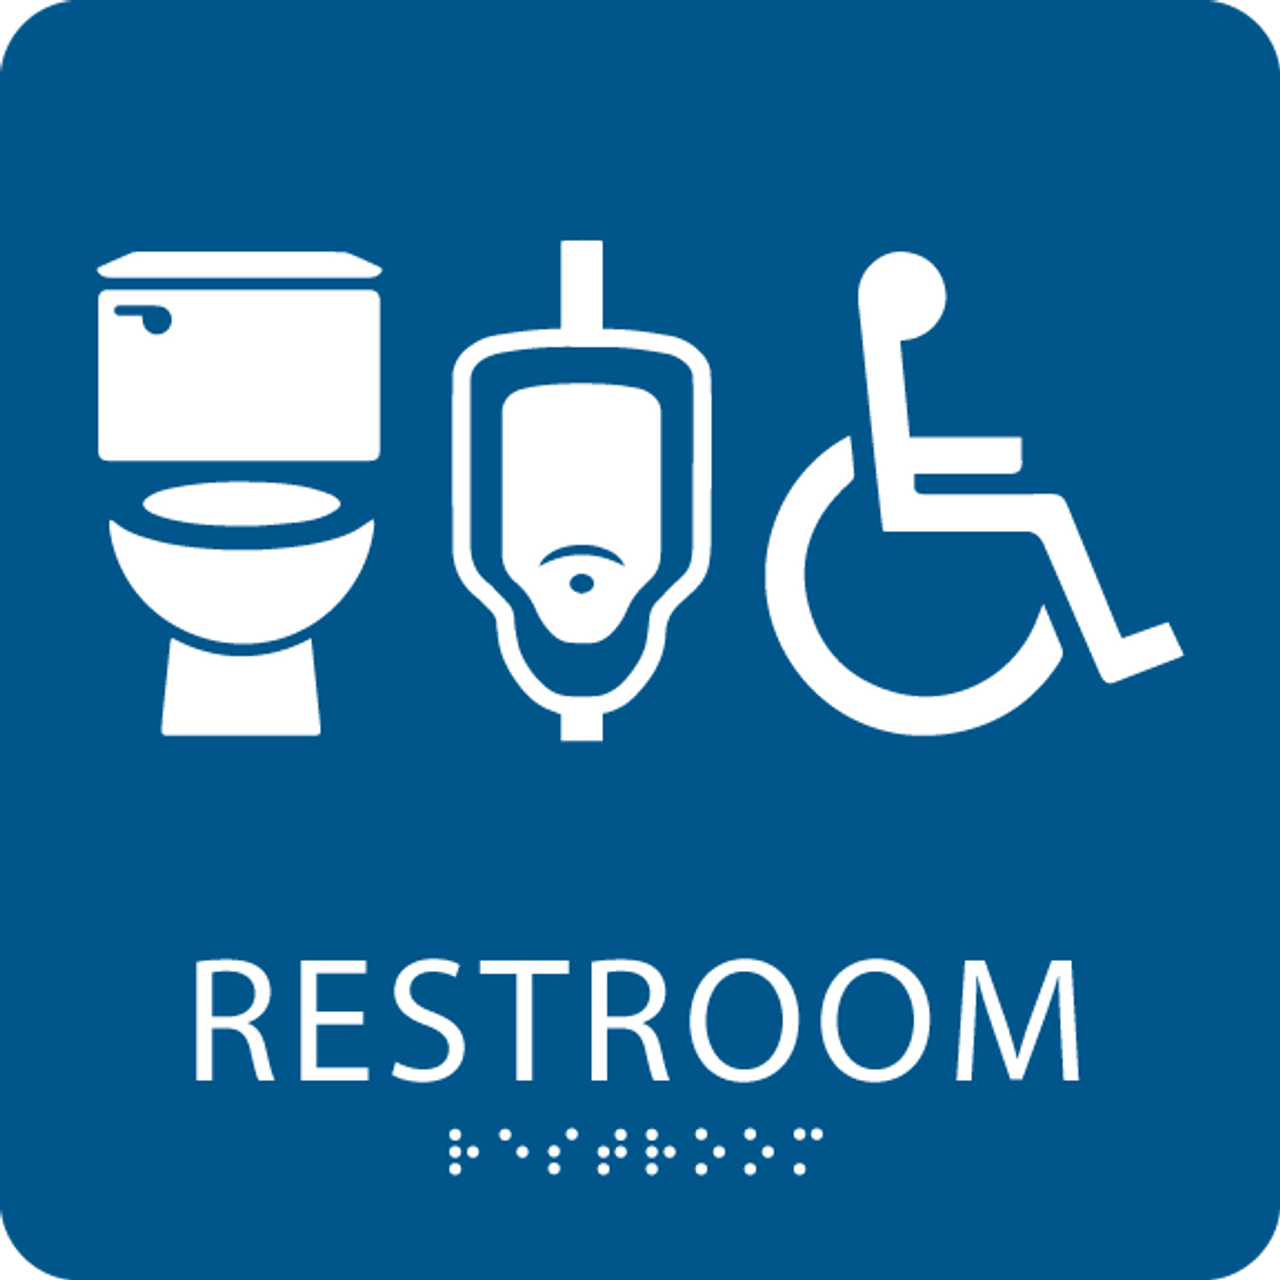 Gender neutral restroom sign with braille